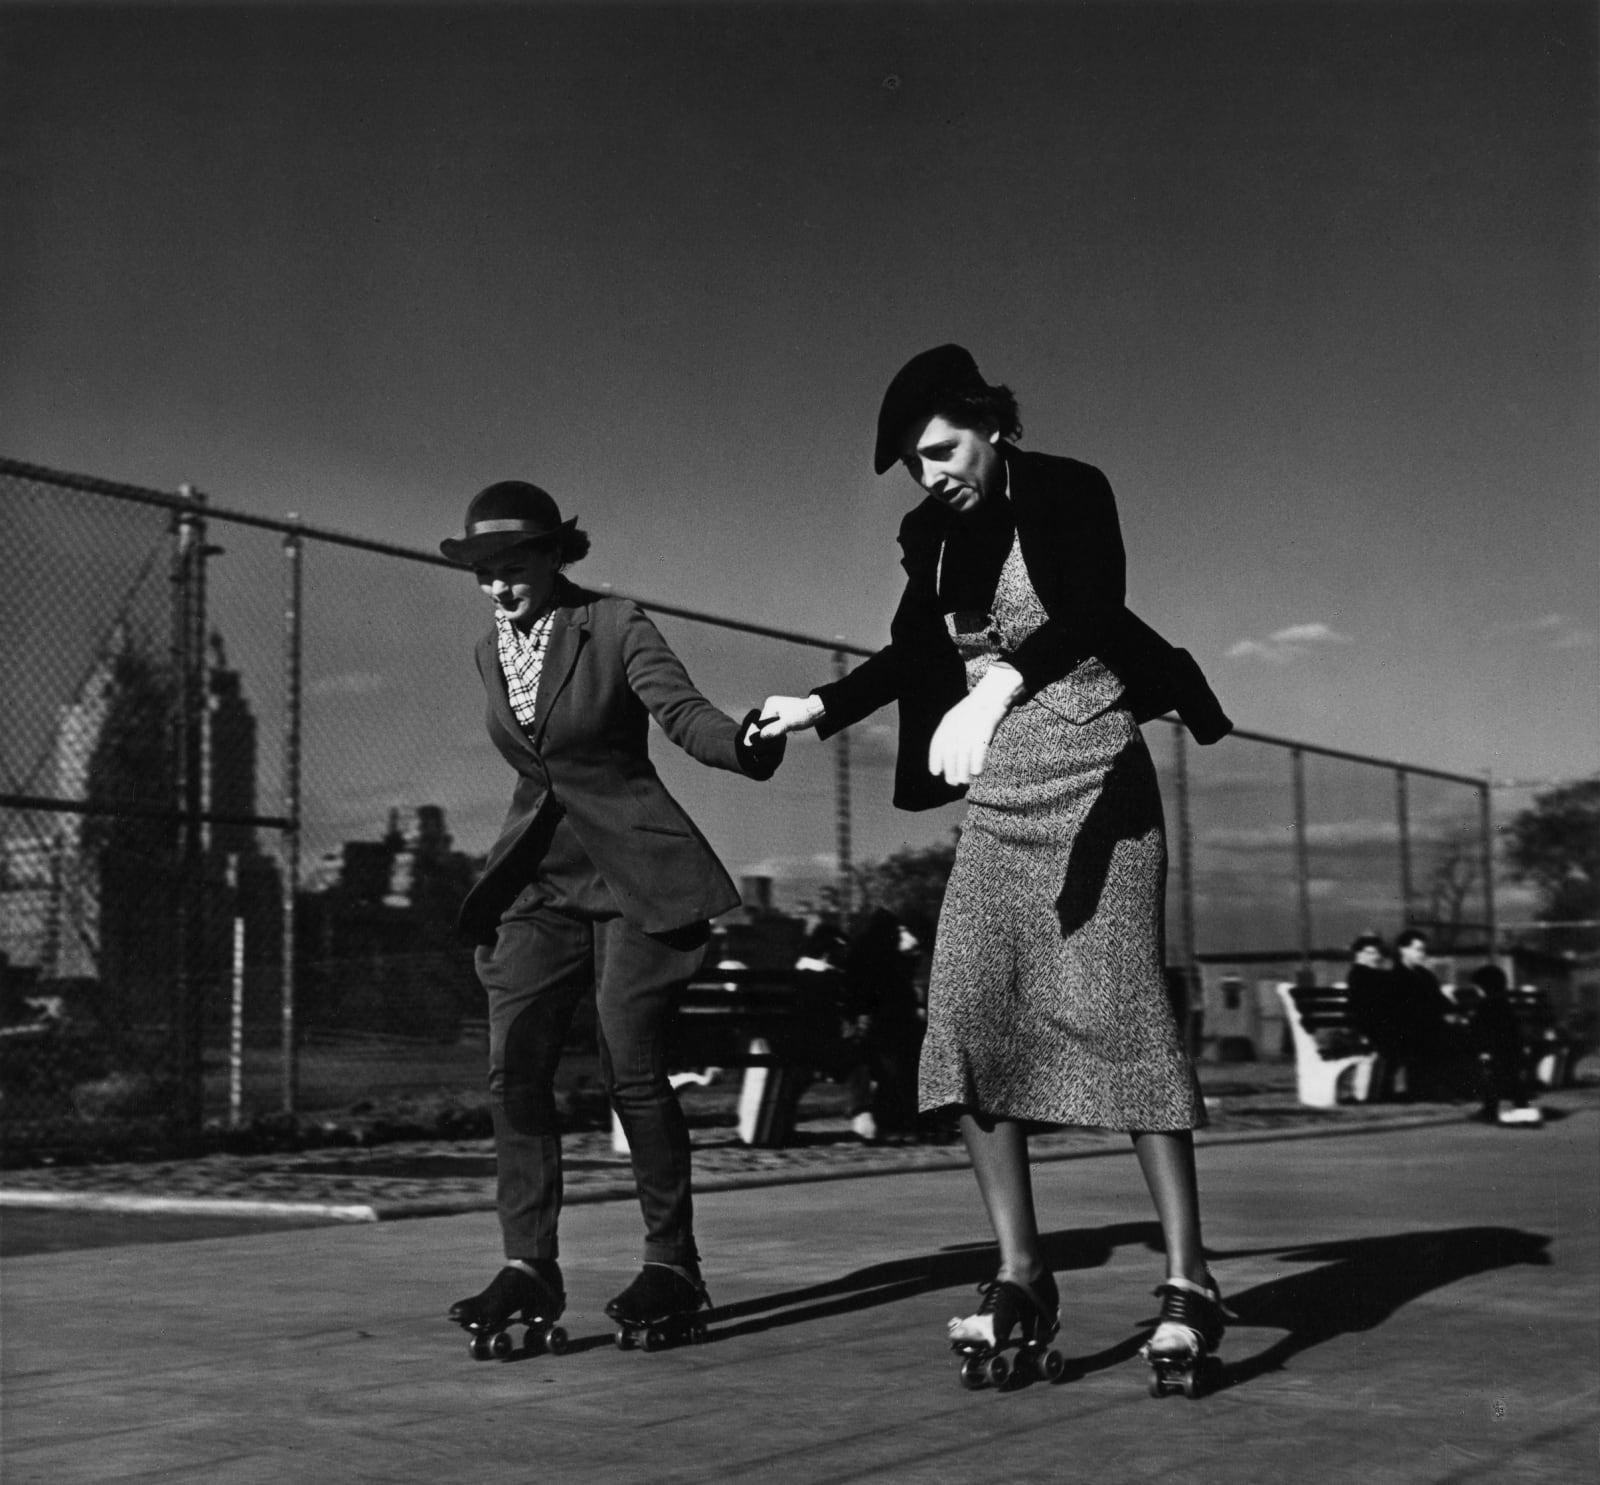 John Gutmann - The Lesson, Central Park, New York, 1936